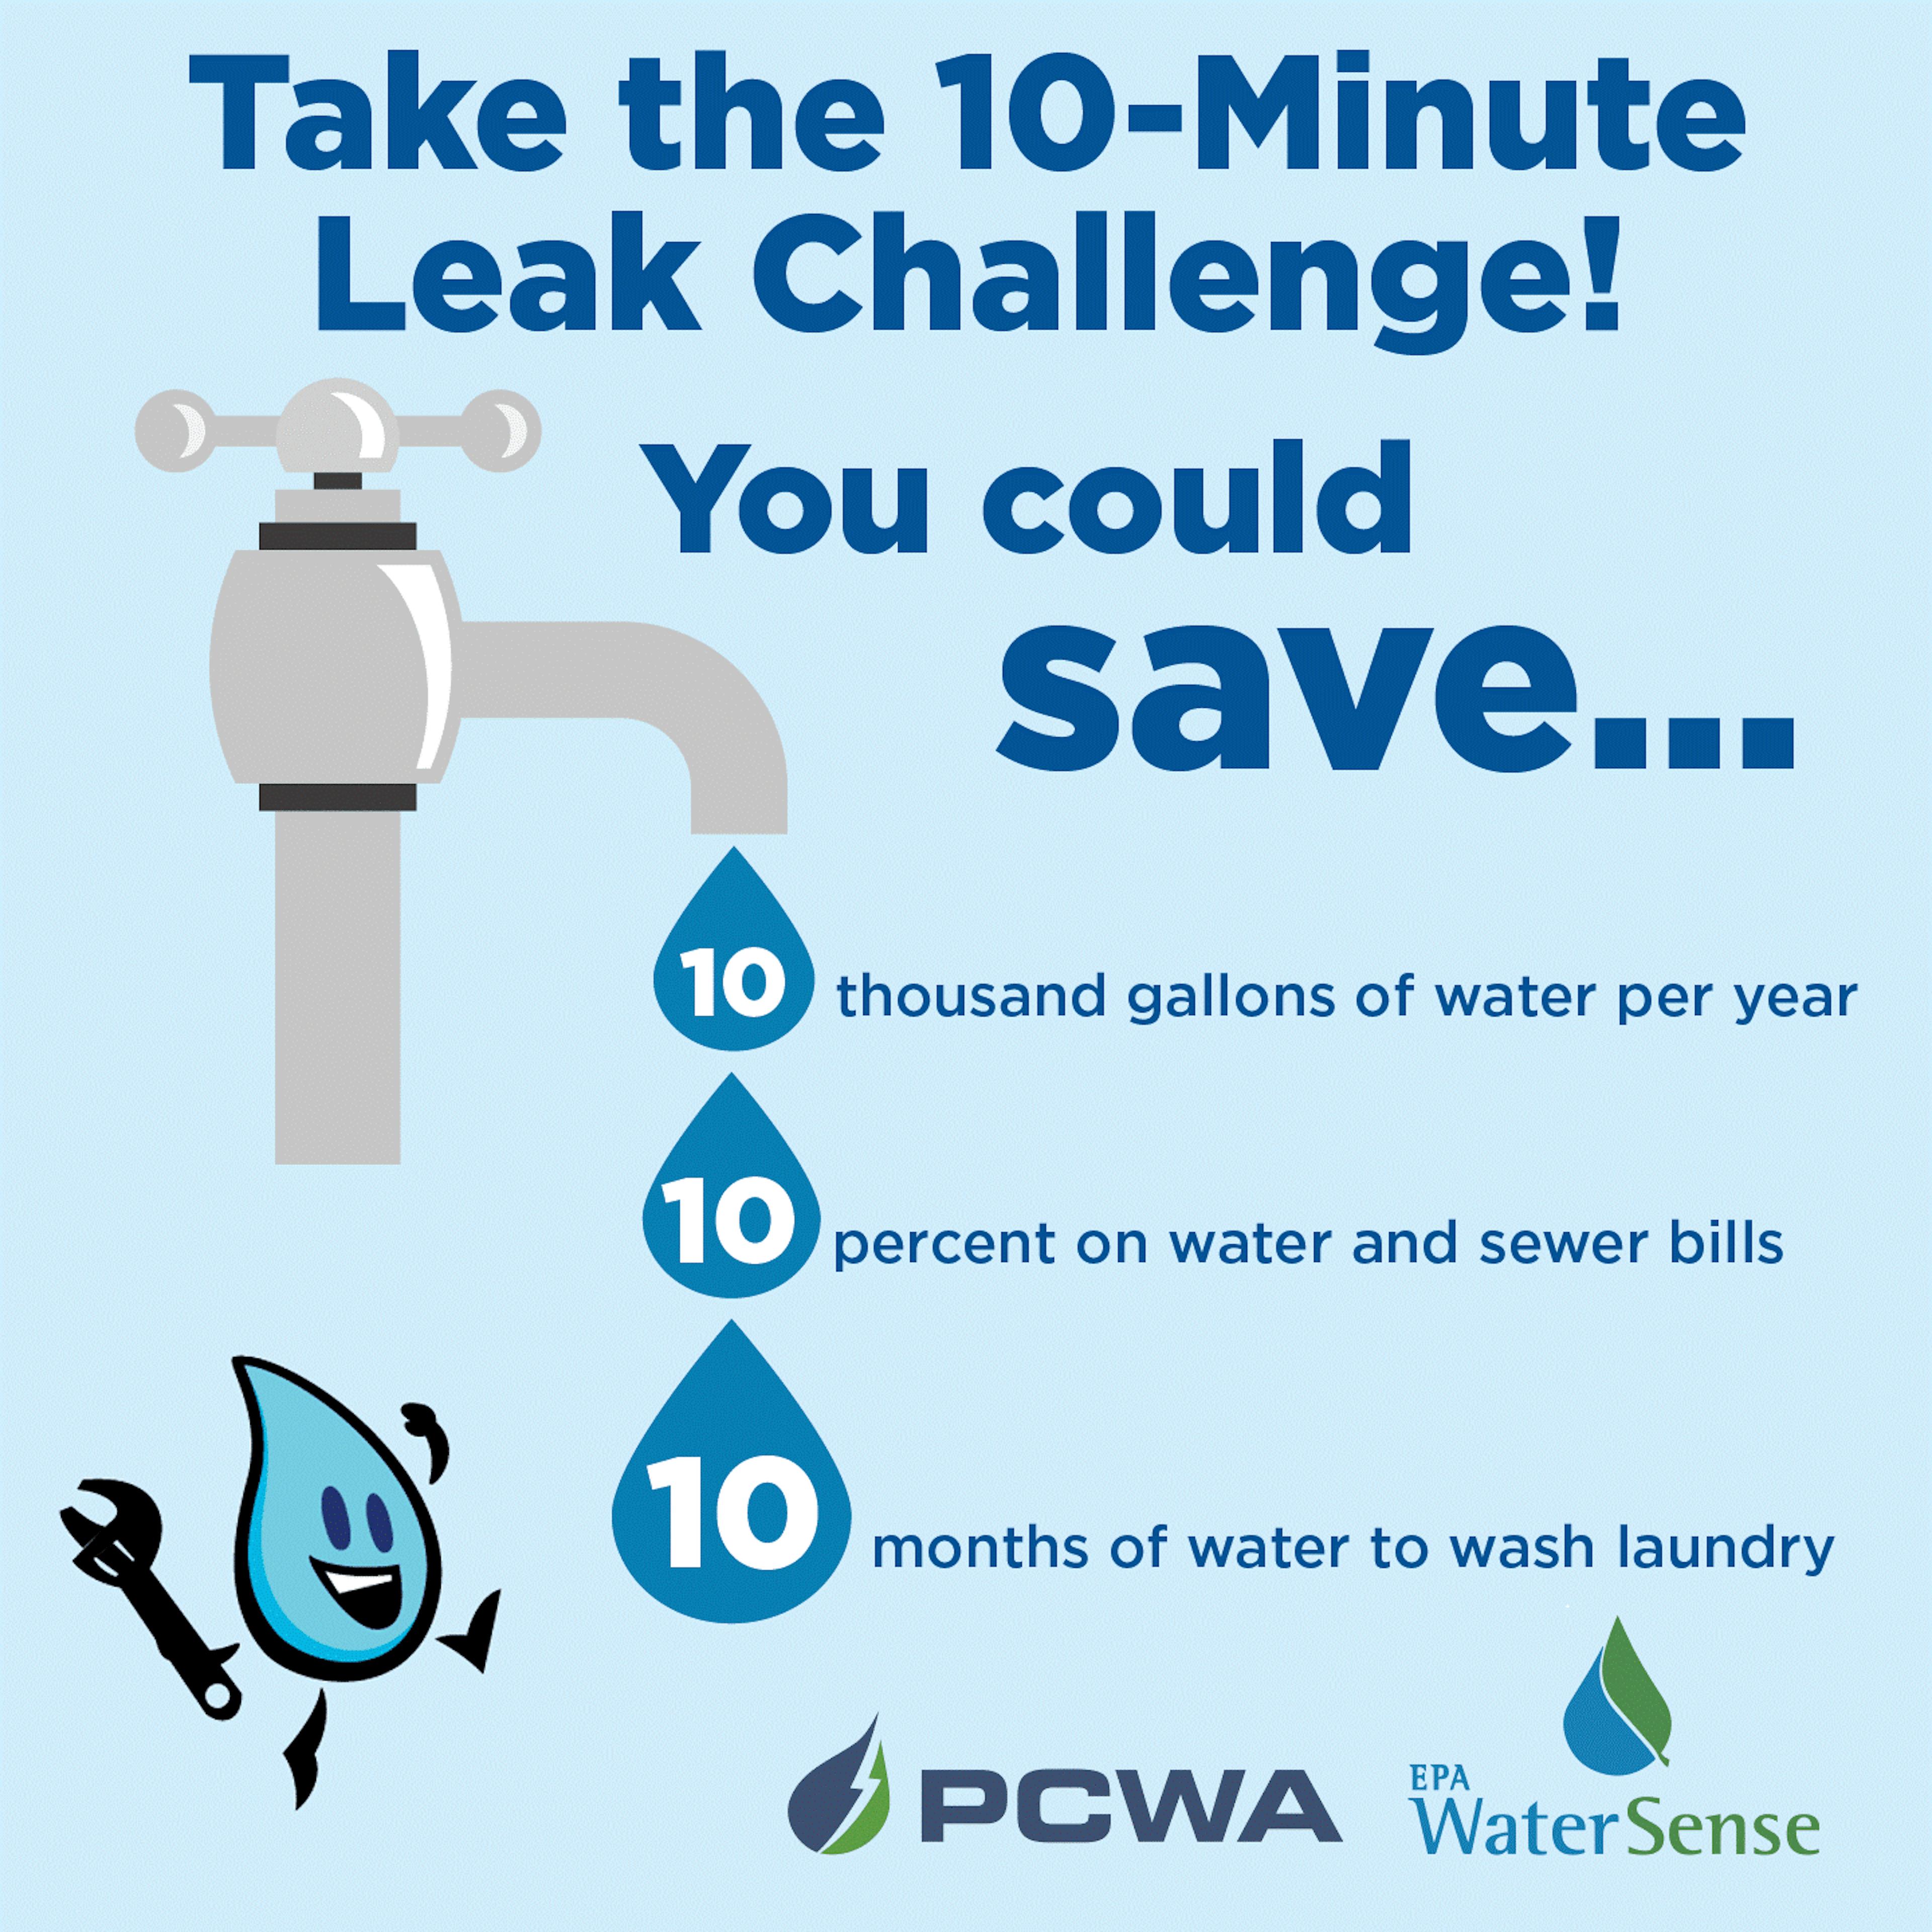 Take the 10 minute leak challenge